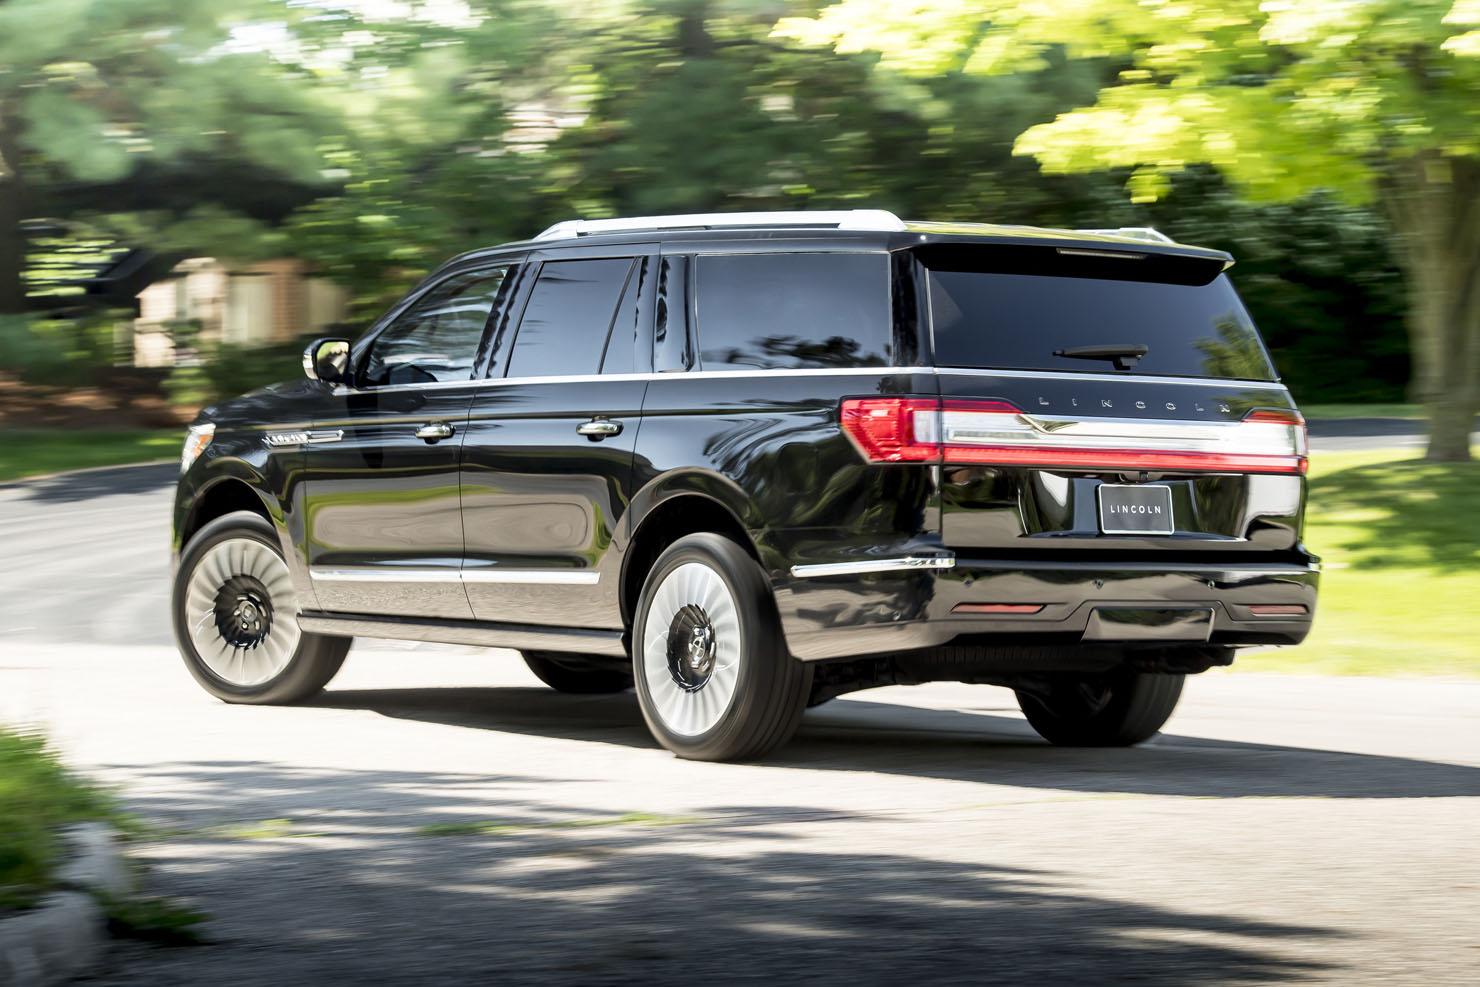 2019 Lincoln Navigator L Photos - Zero To 60 Times